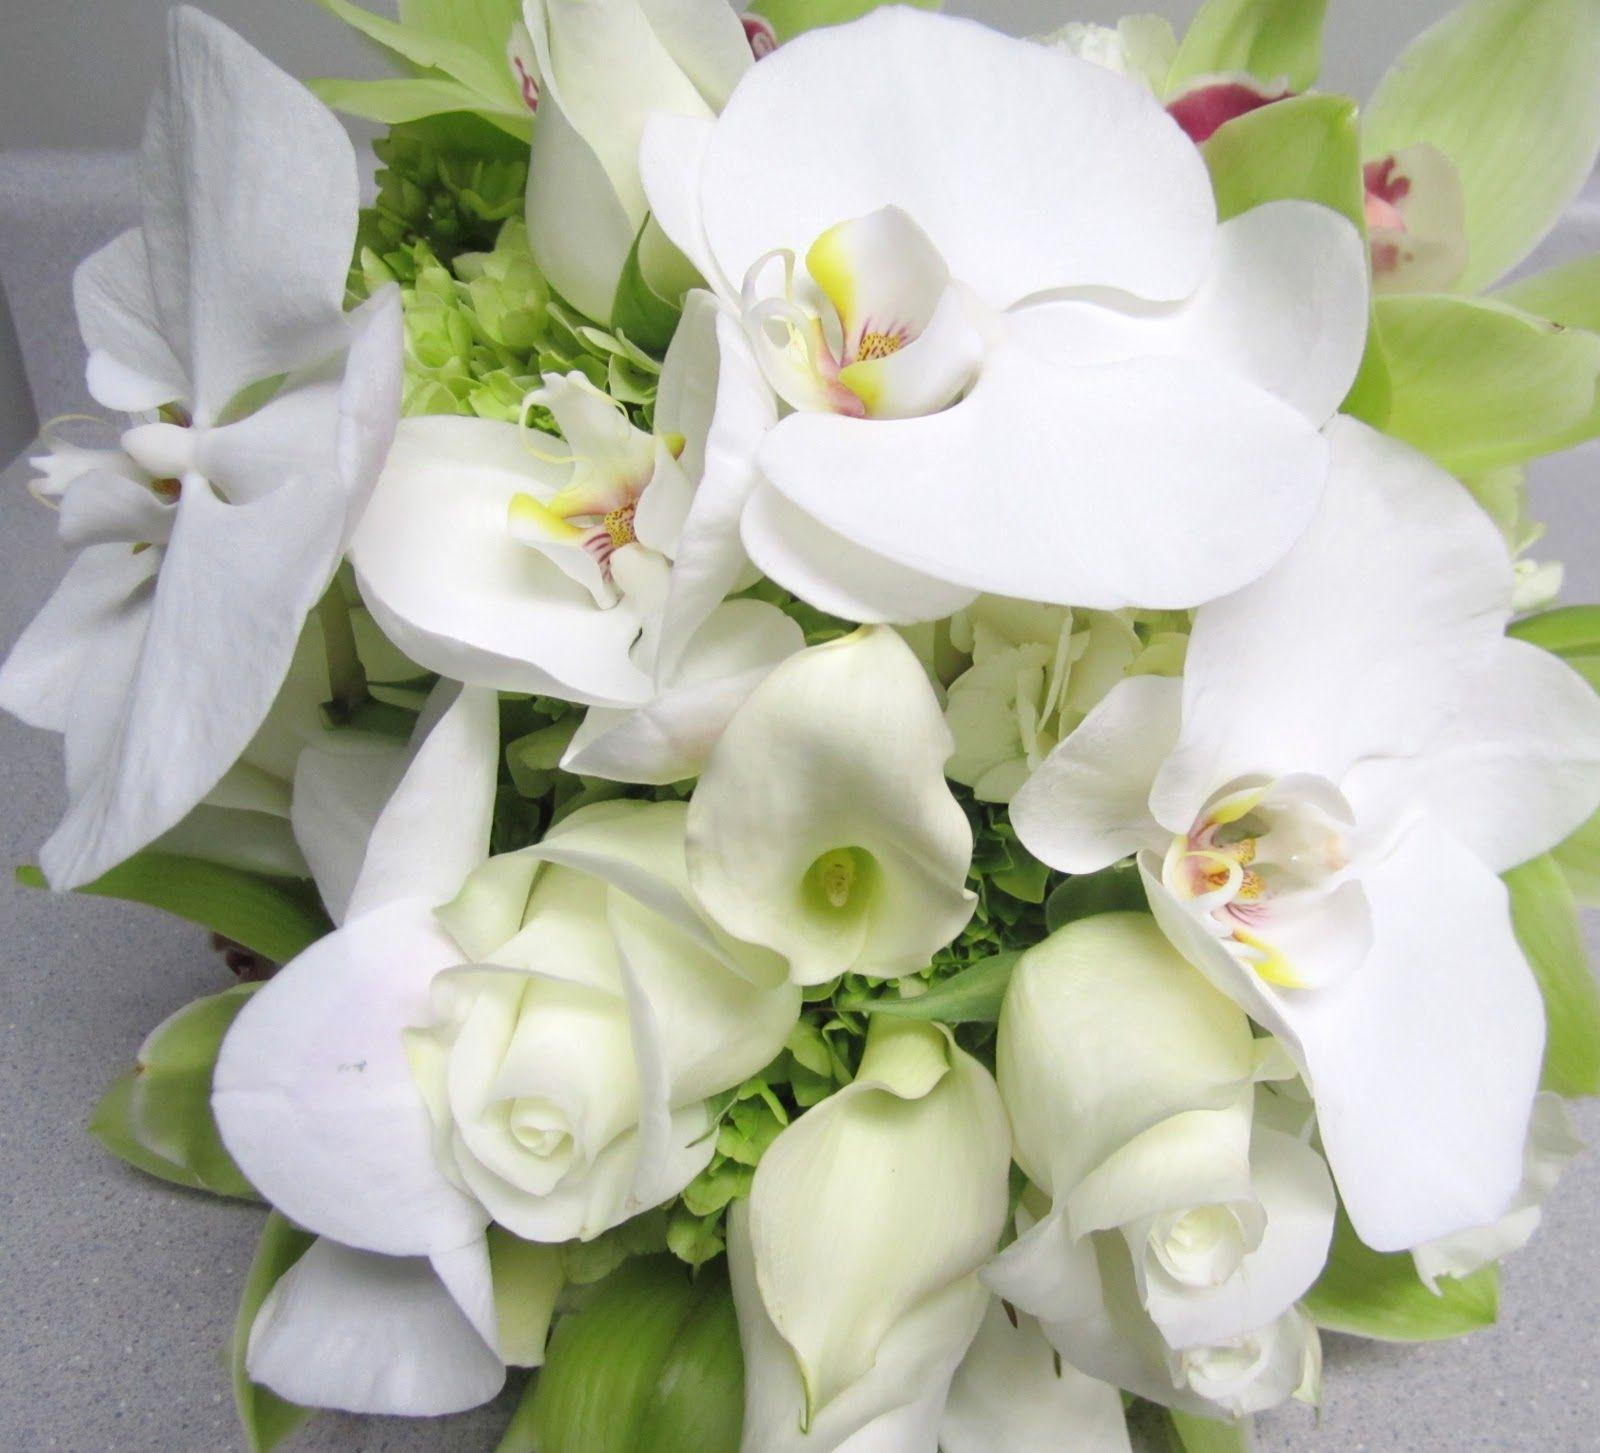 hd wallpapers green and white phaelanopsis - Google zoeken